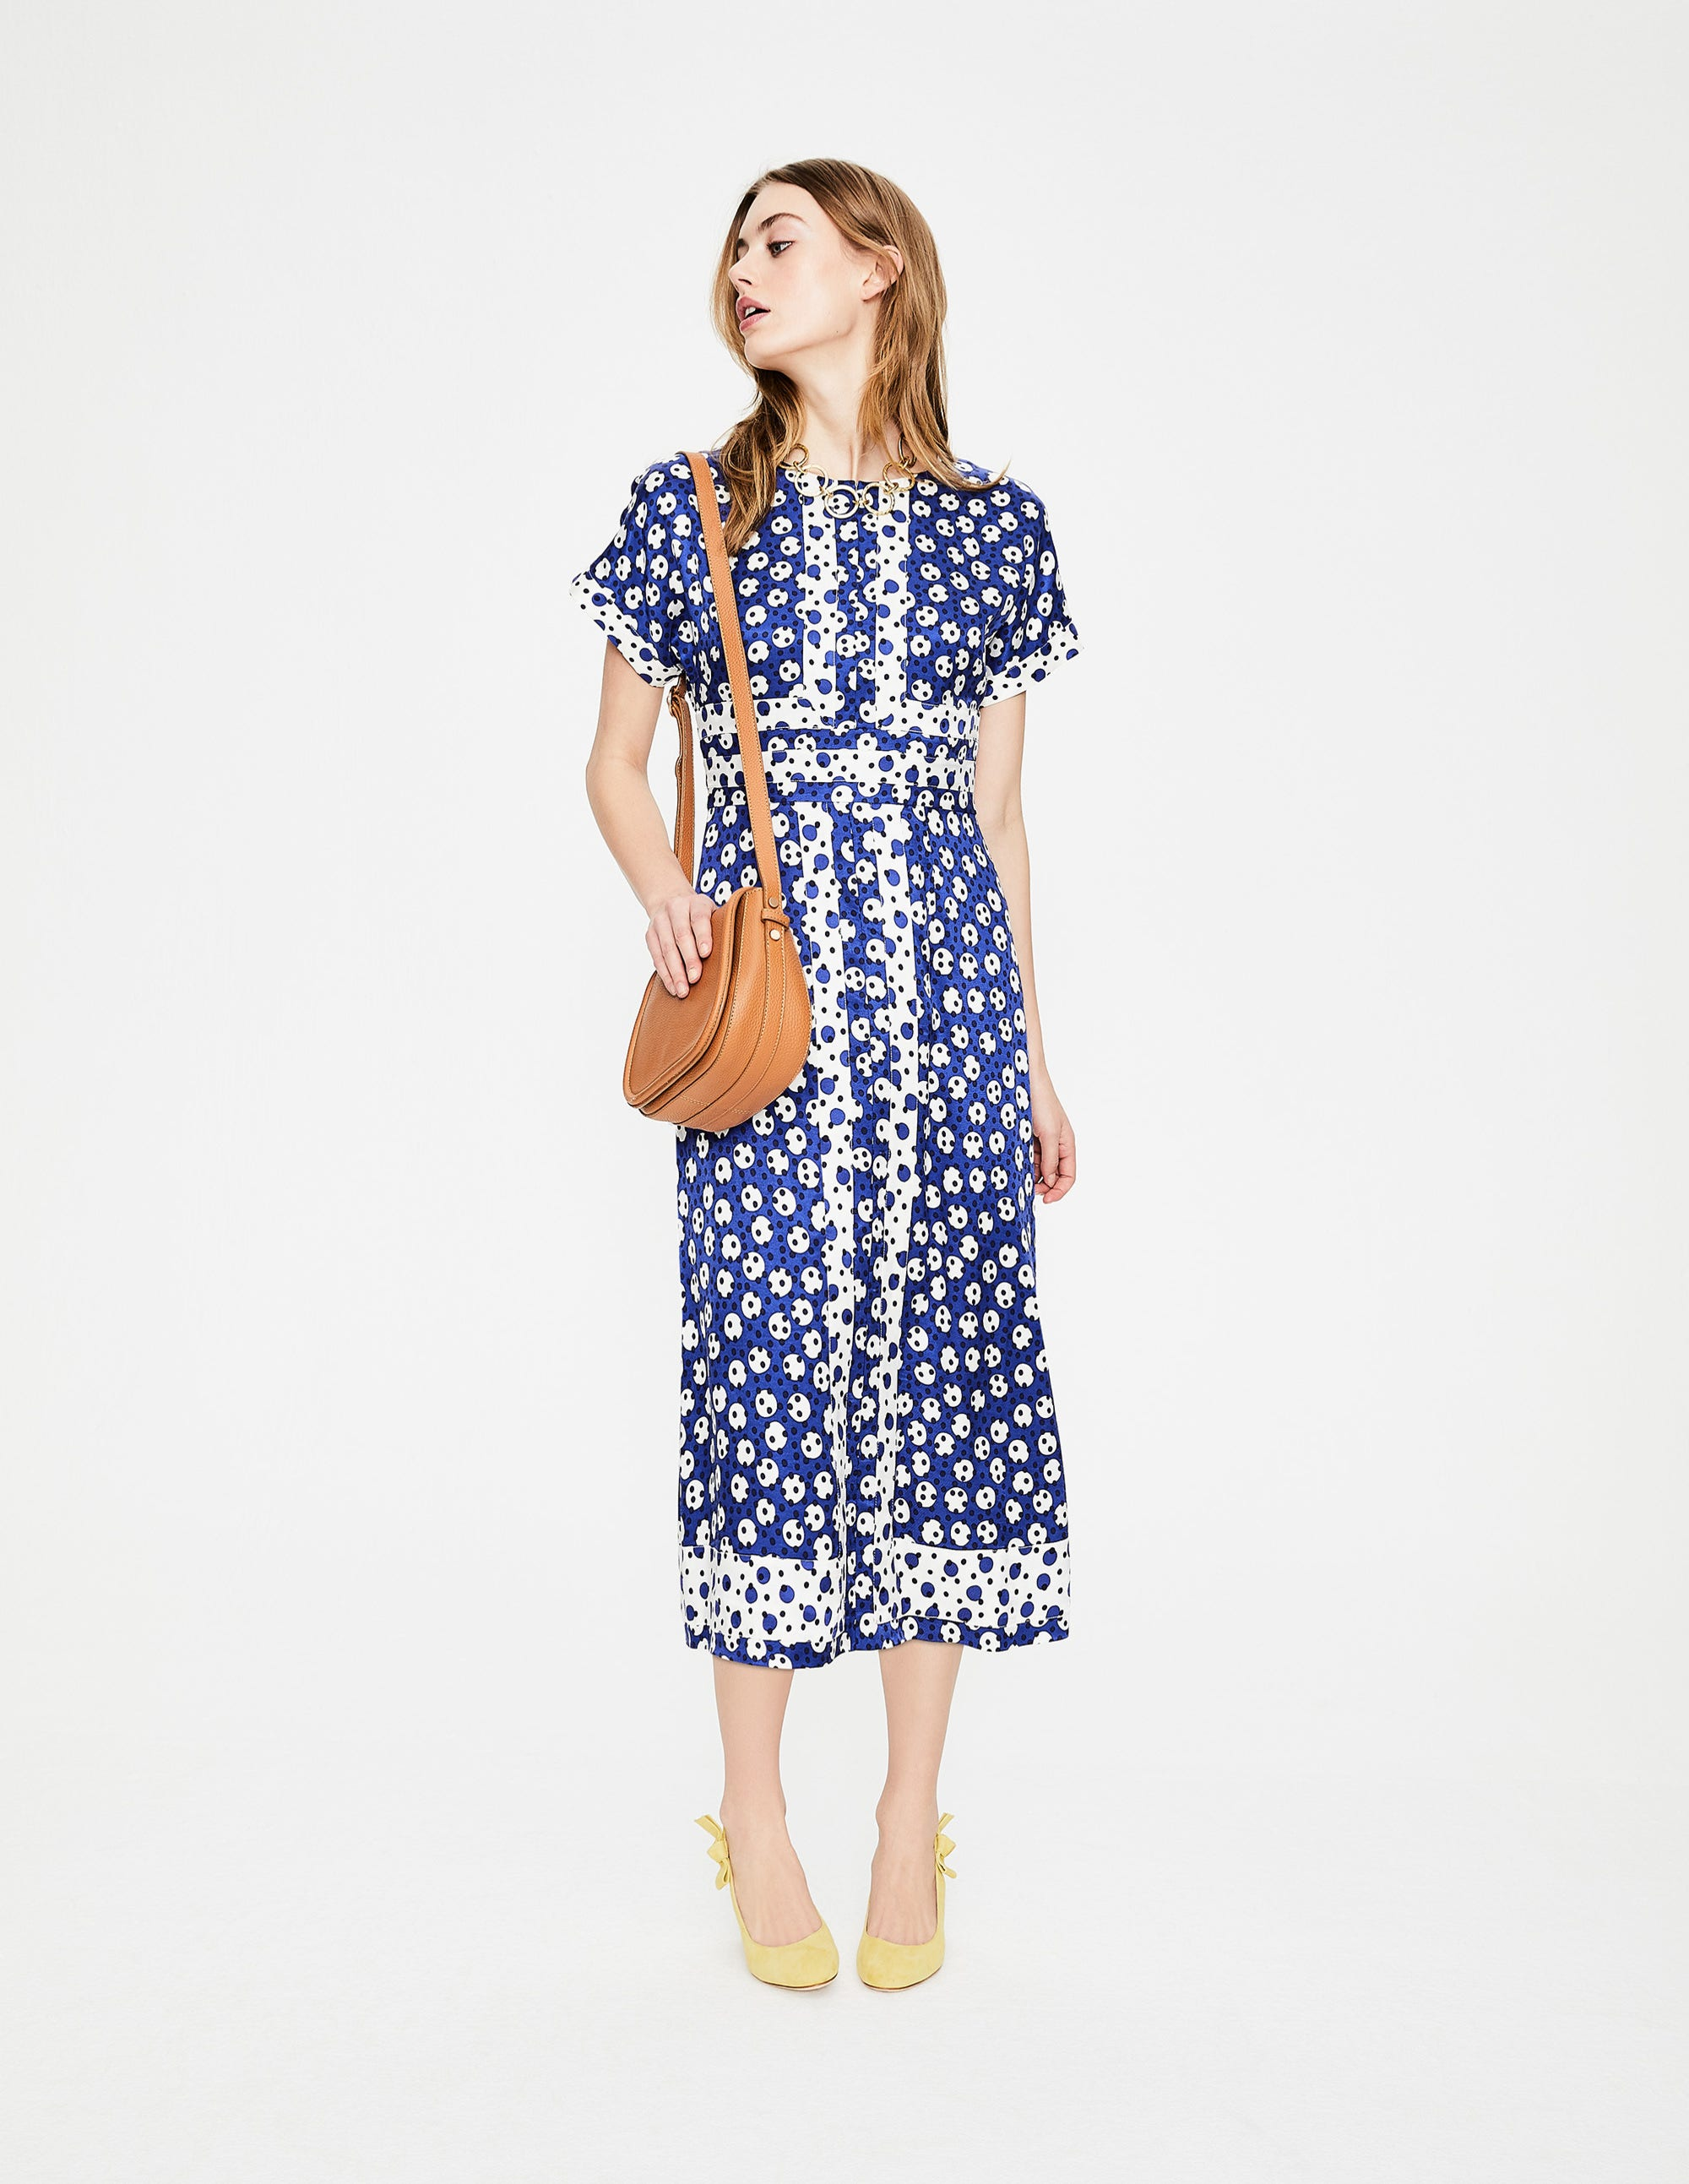 6c3555765e6ee Esmeralda Dress - Greek Blue Random Spot | Boden UK